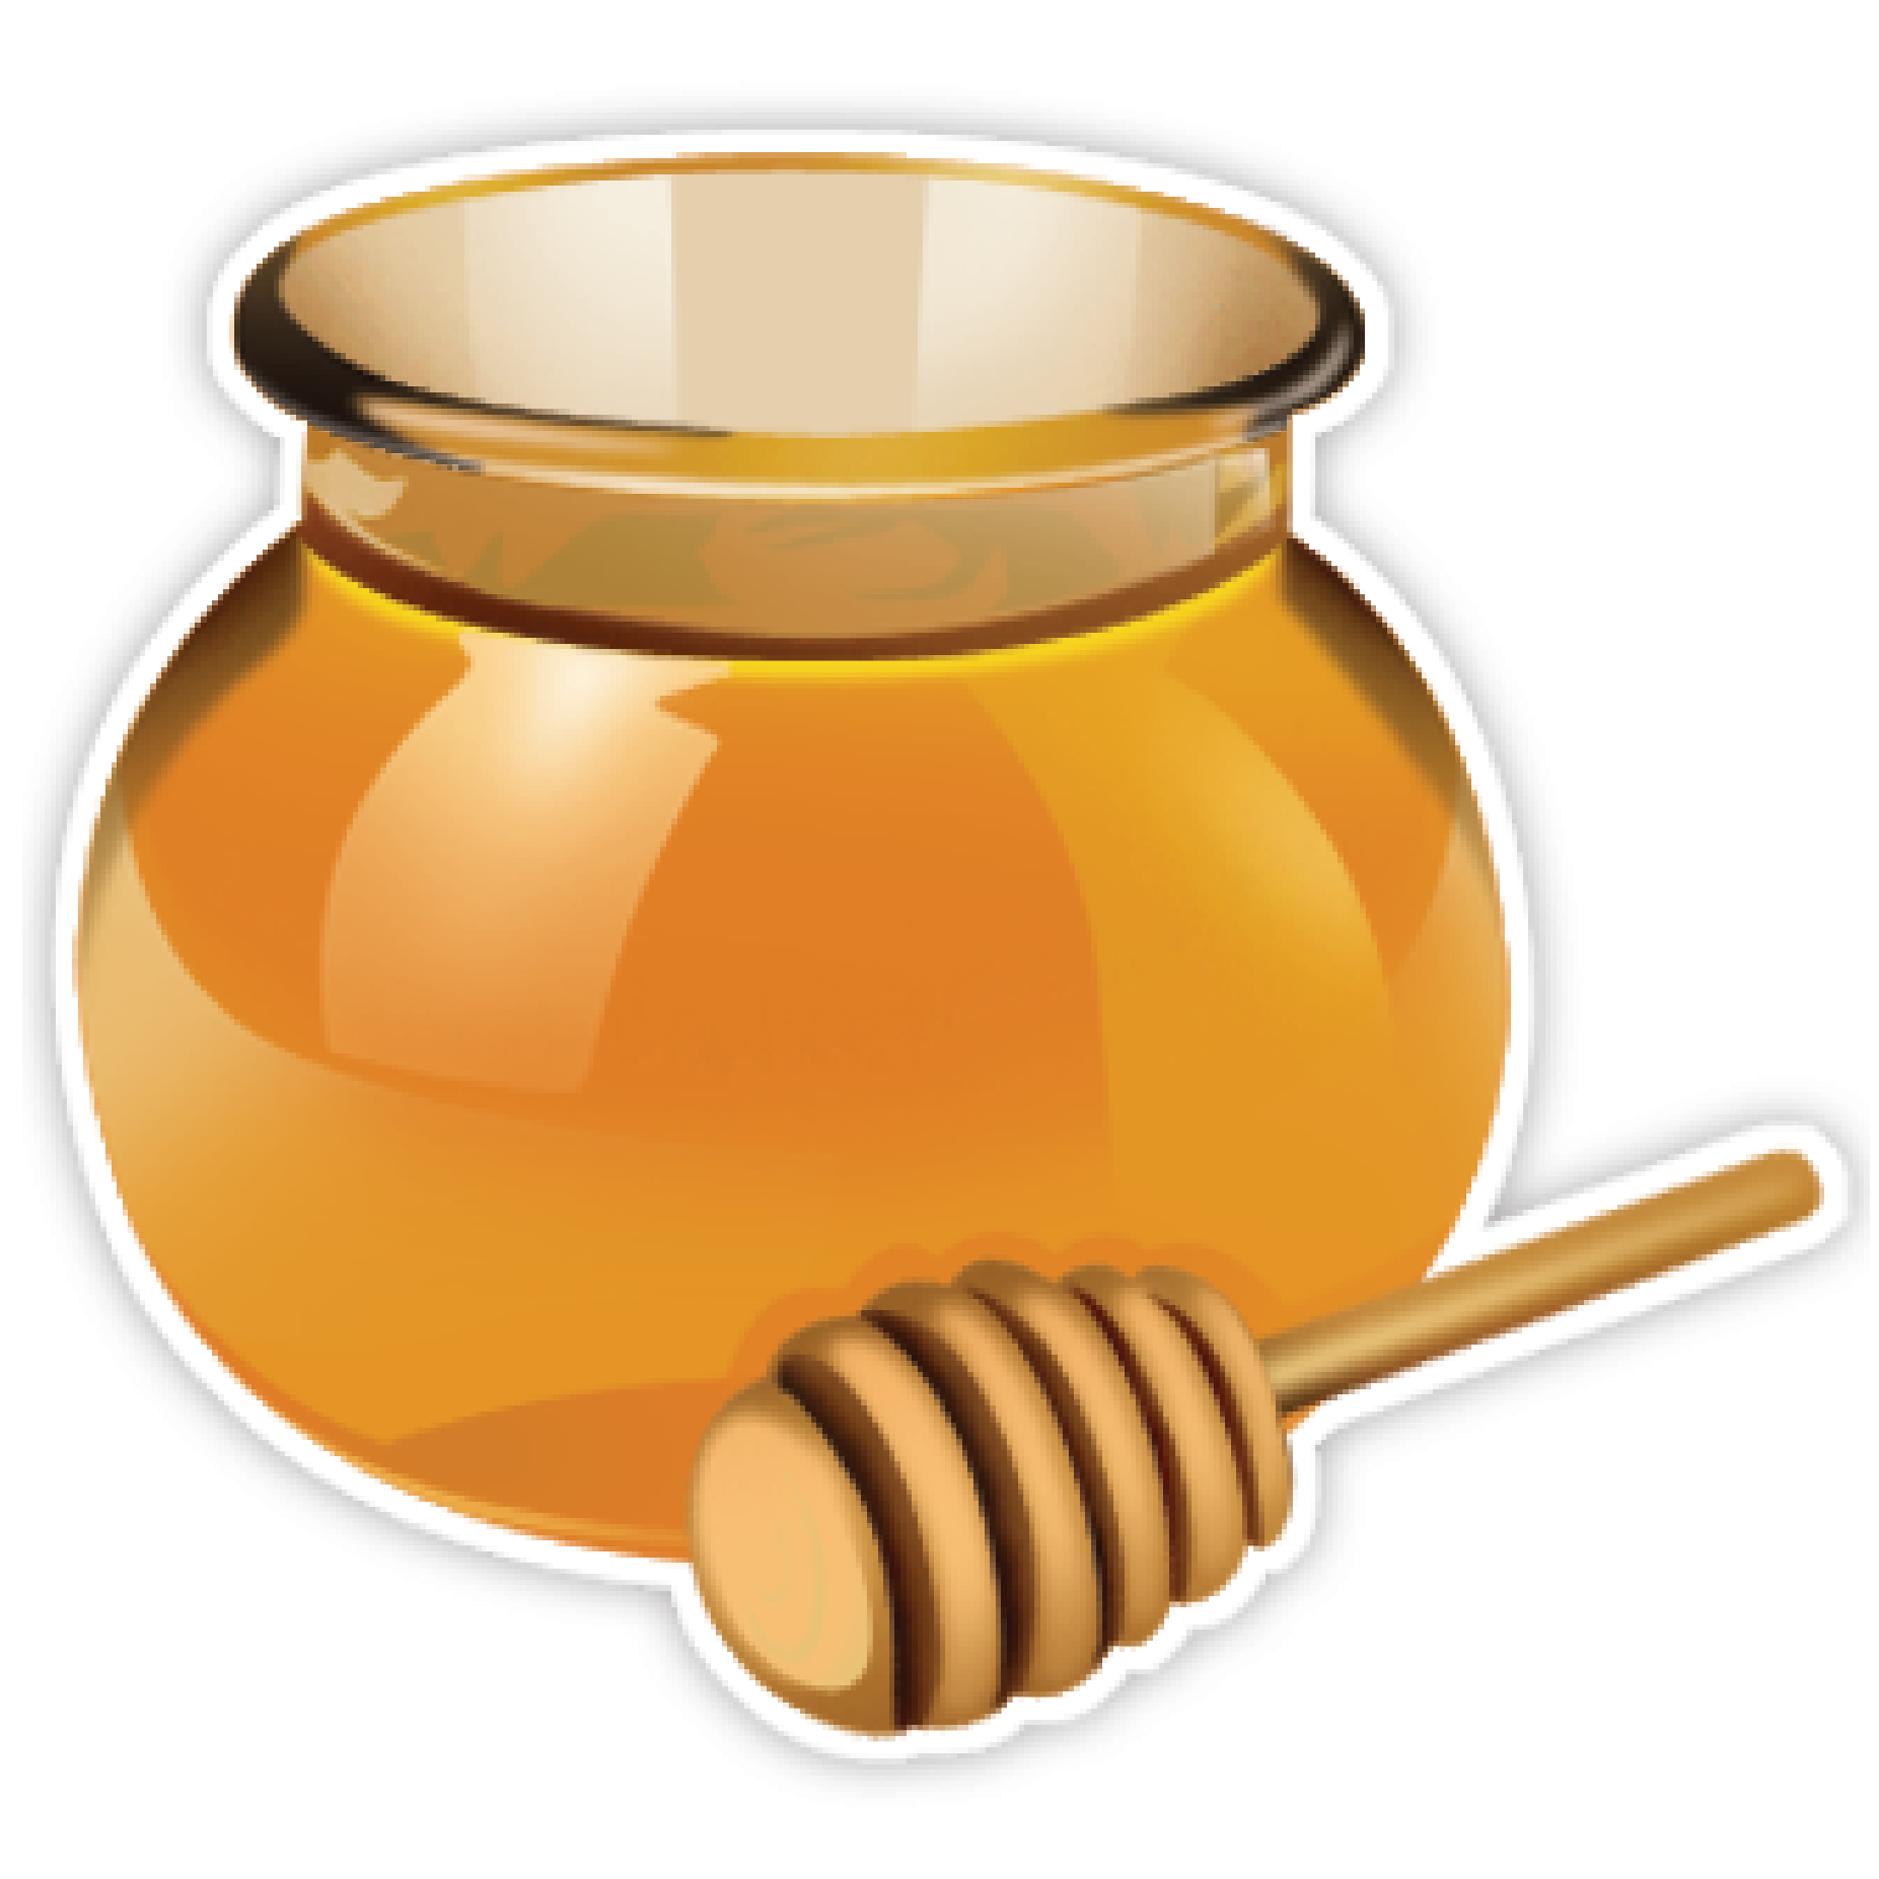 Free Honey Cliparts, Download Free Clip Art, Free Clip Art.